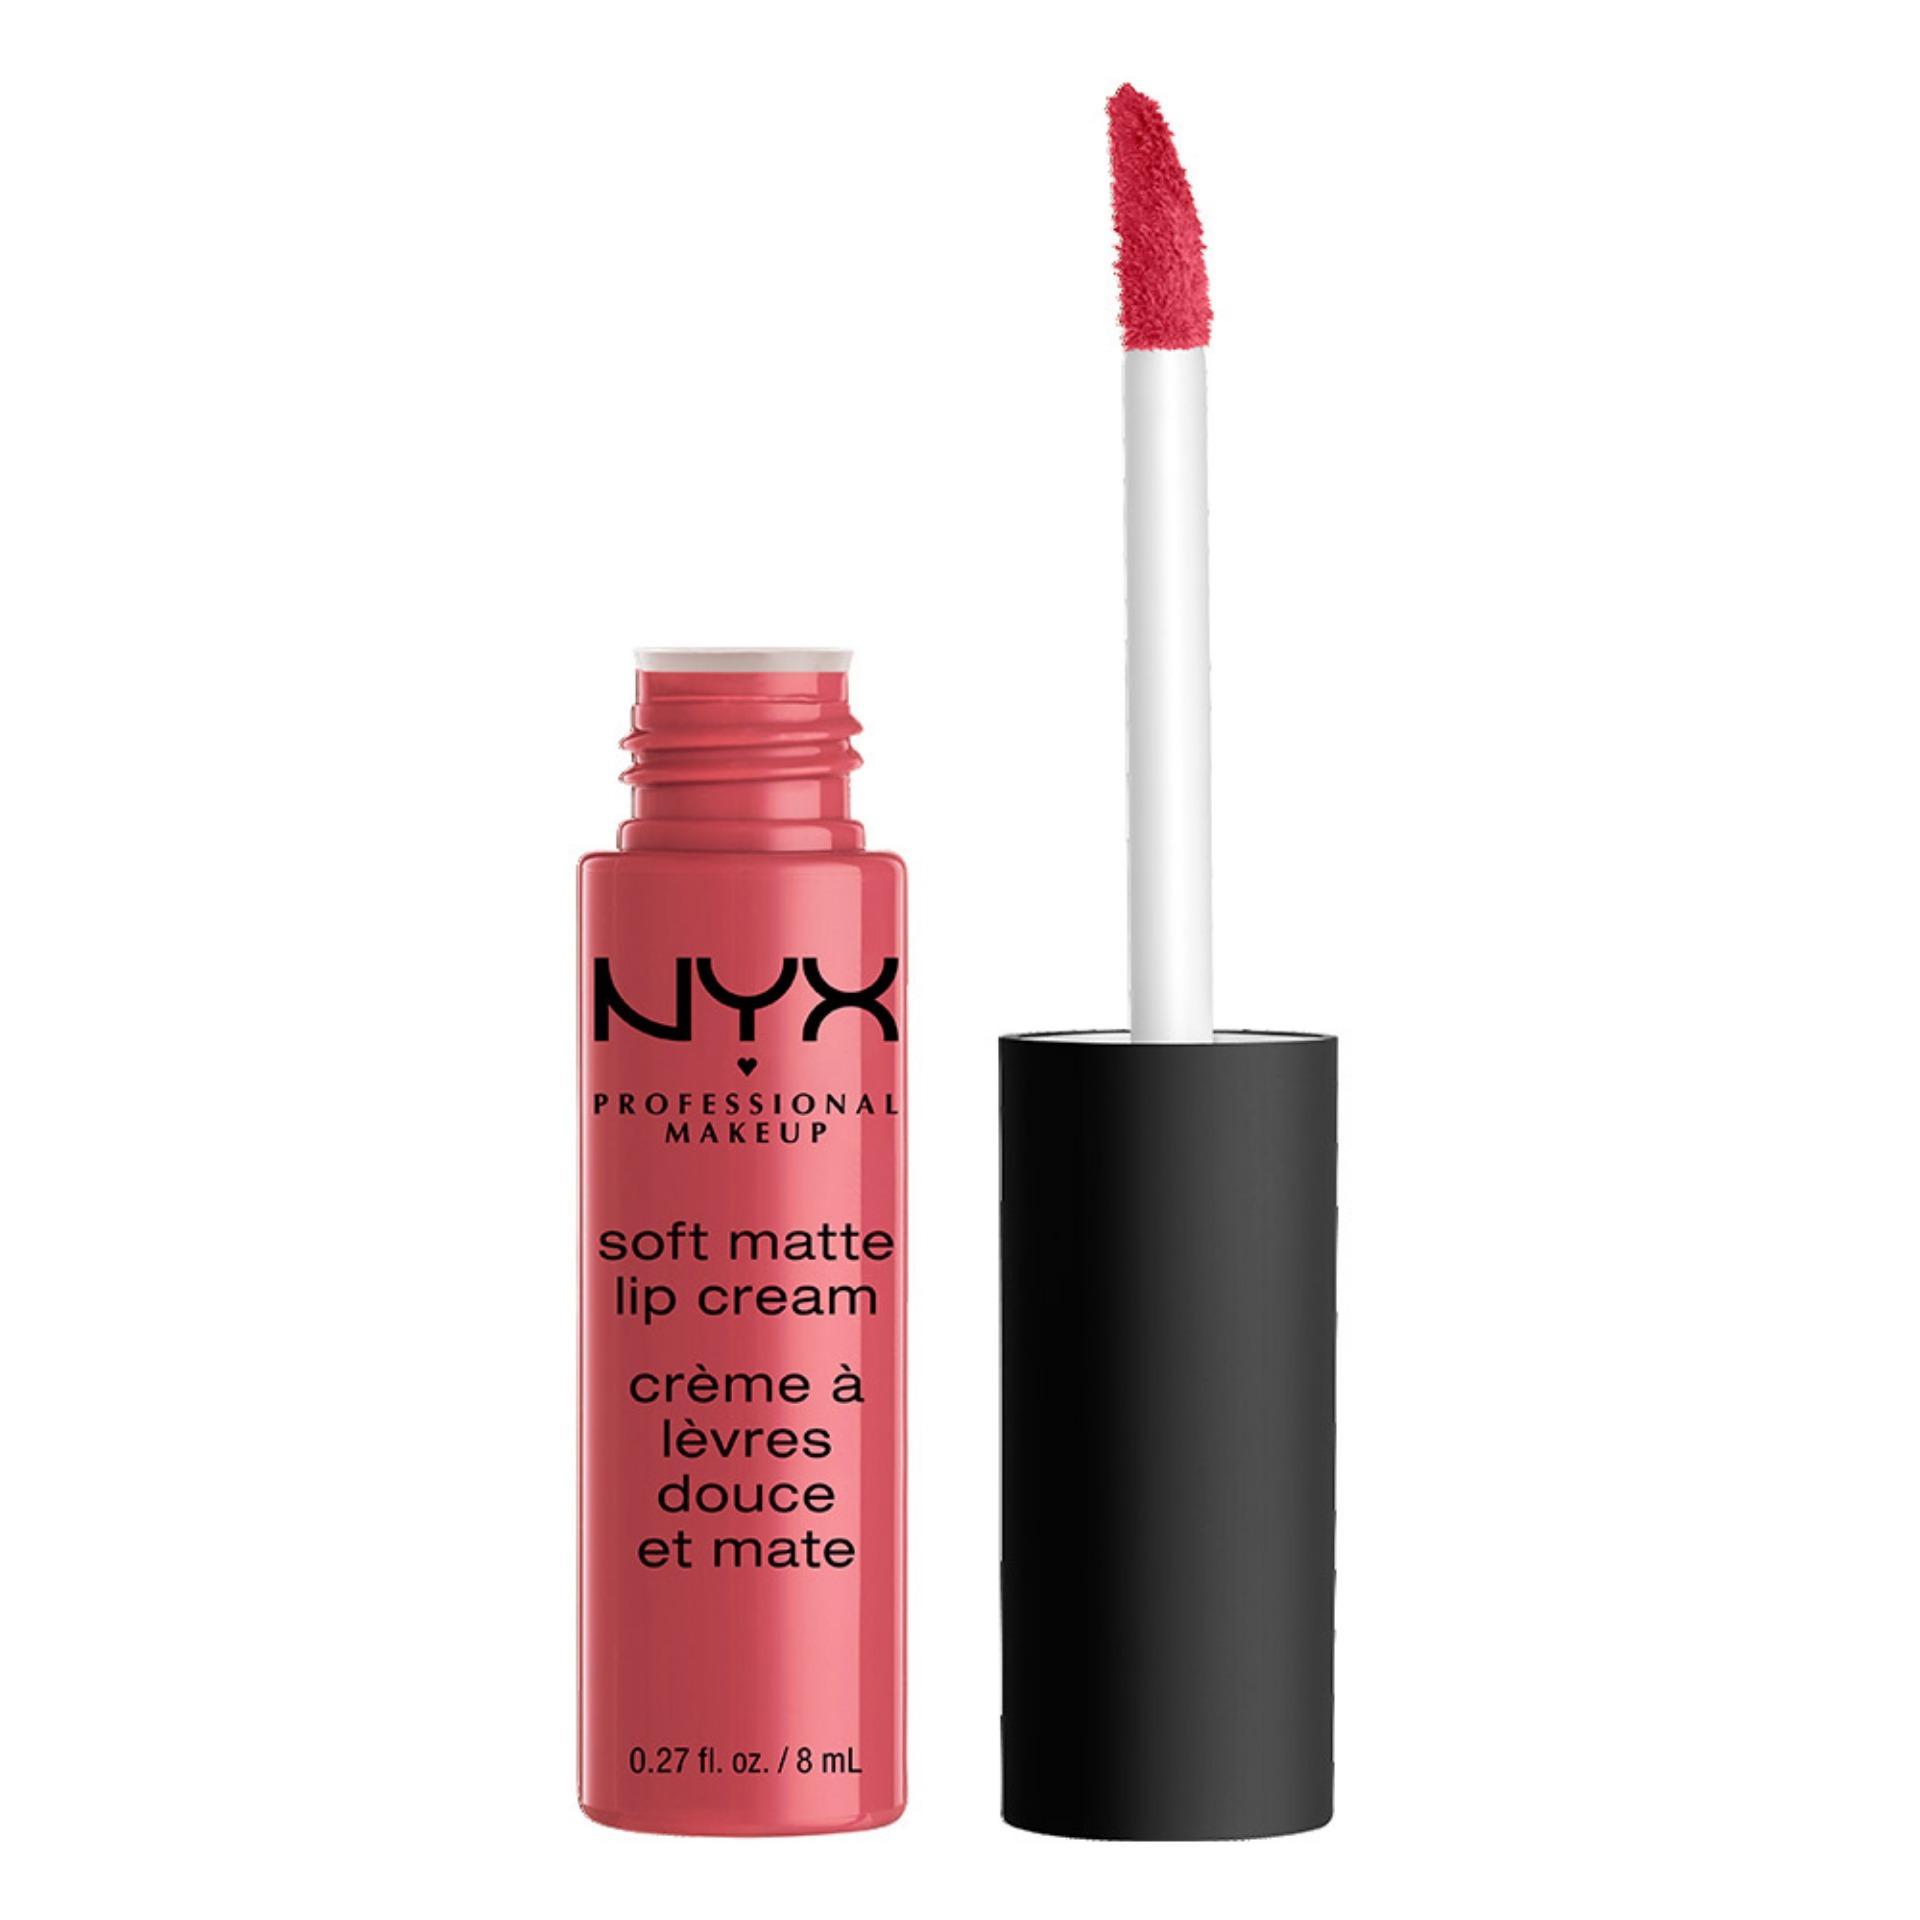 NYX Professional Makeup Soft Matte Lip Cream - 08 San Paulo